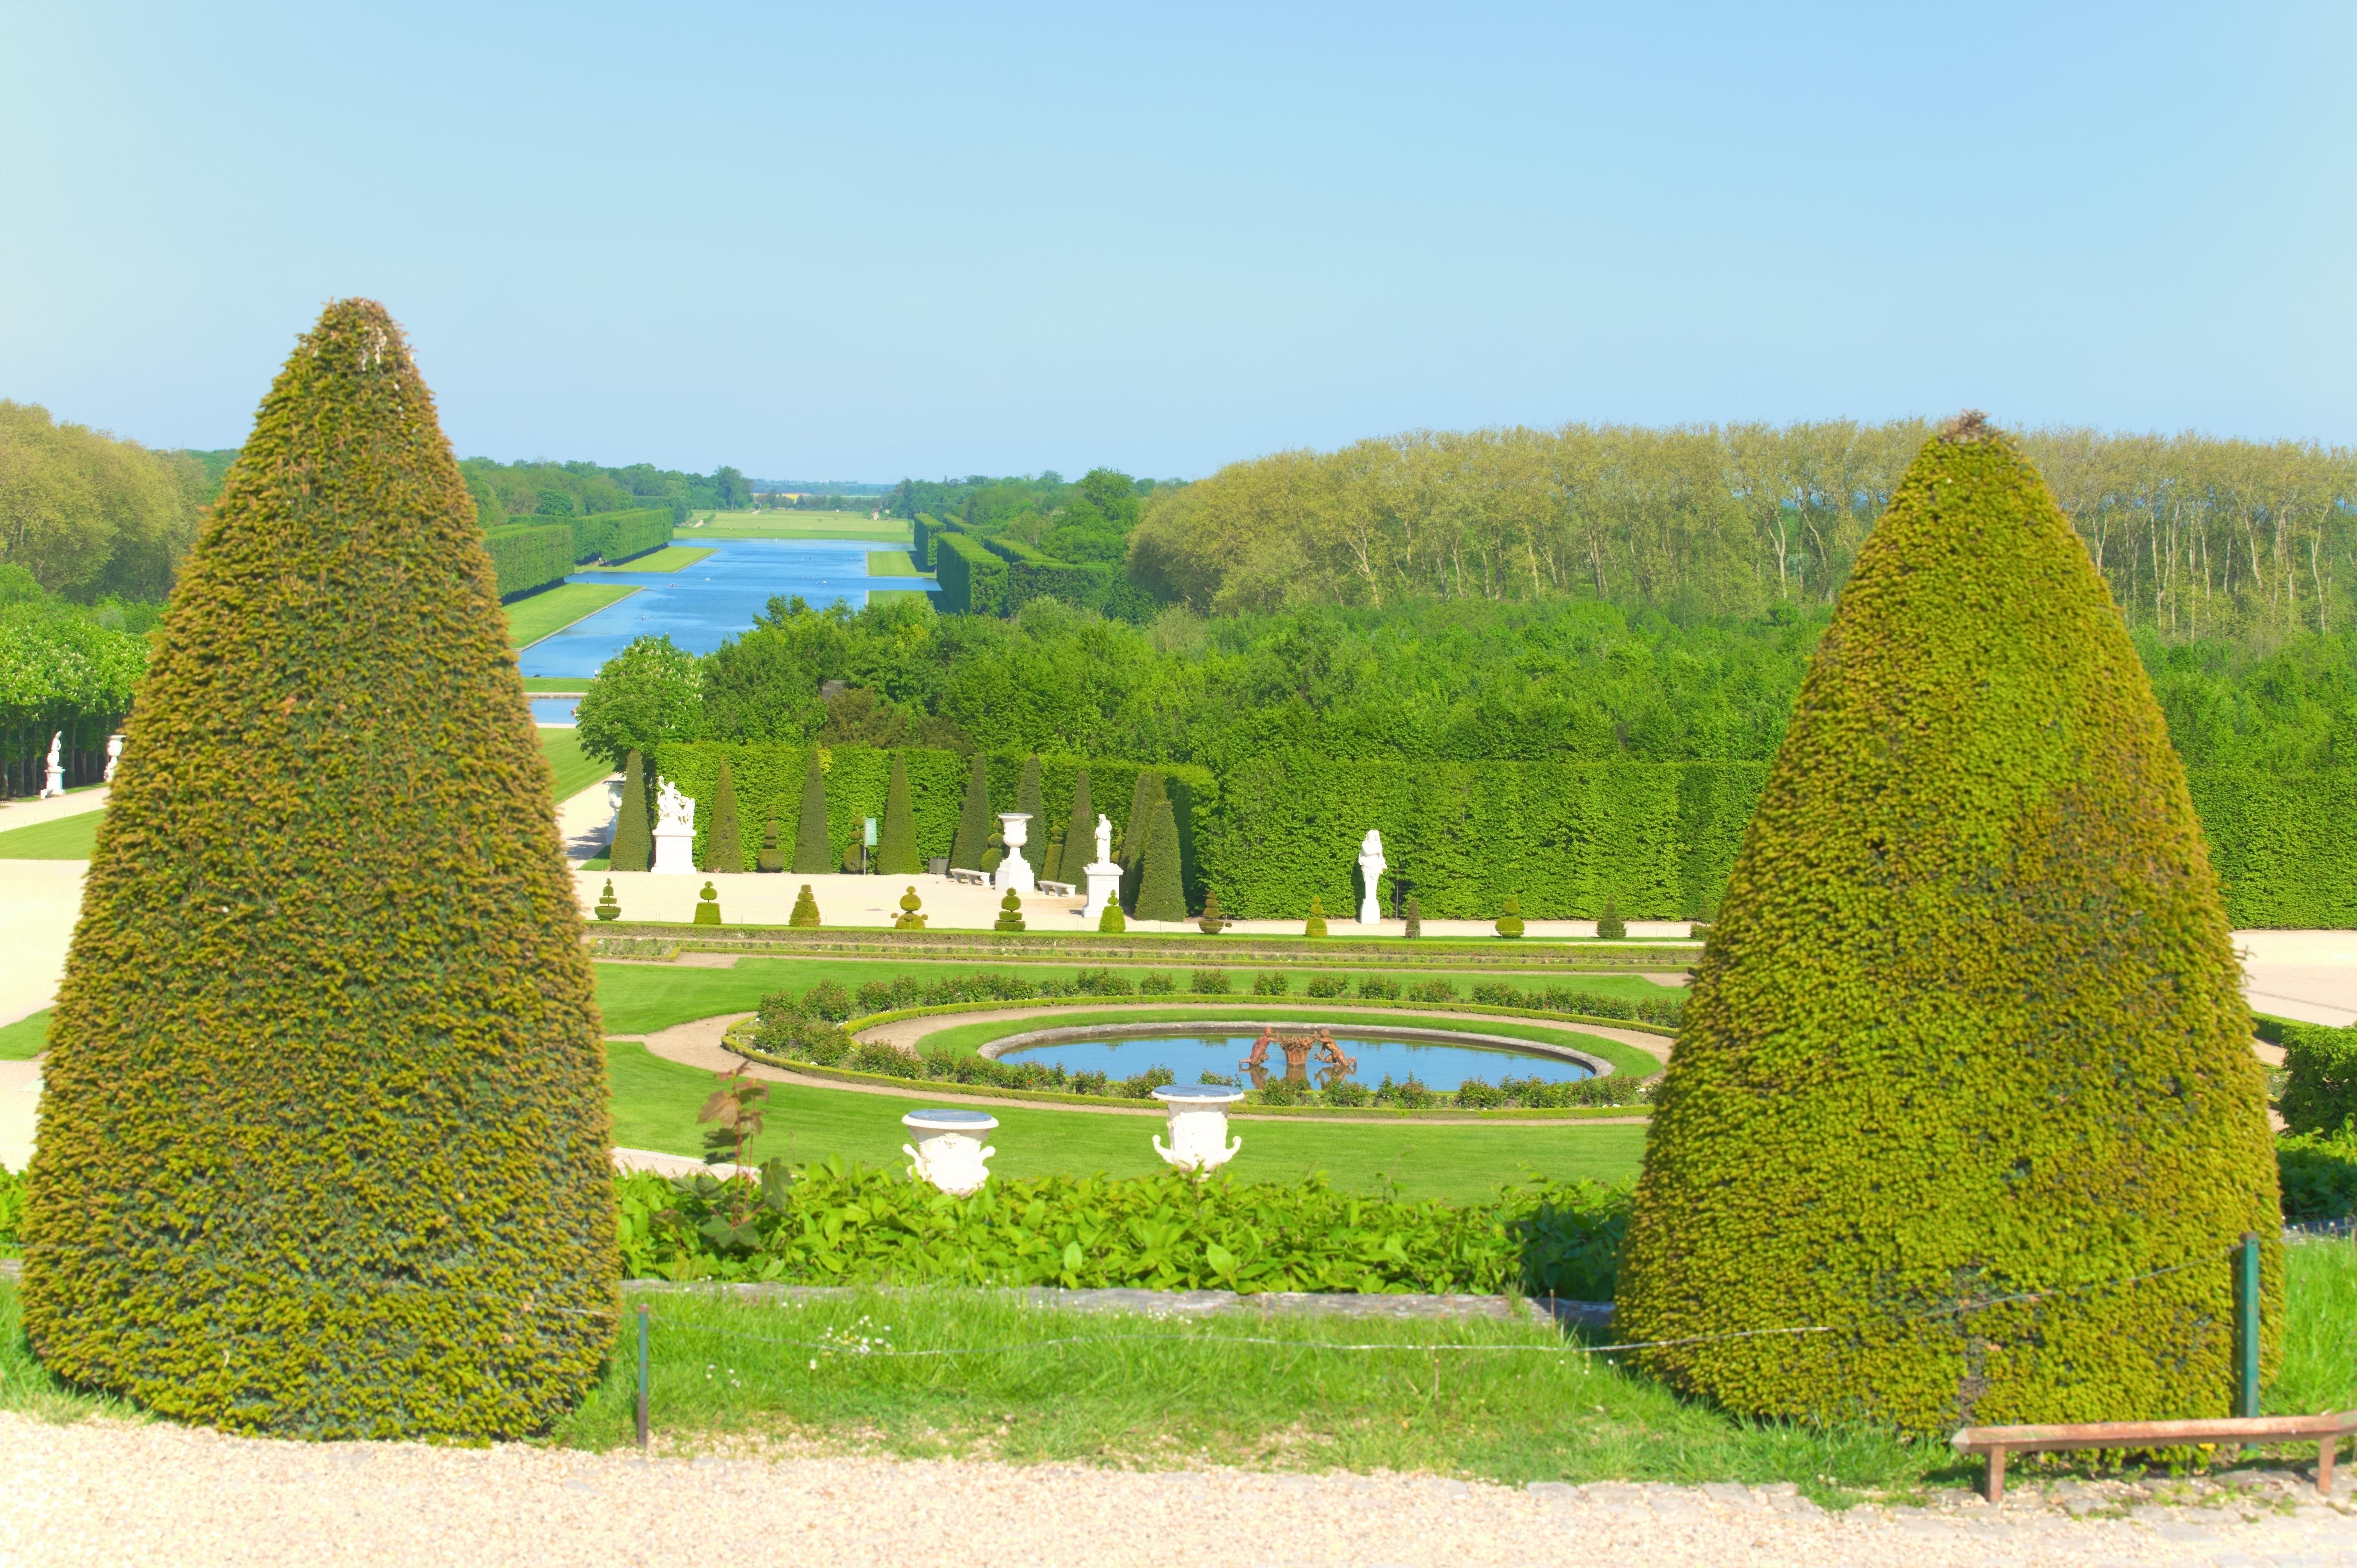 filele chateau de versailles le jardin 64jpg - Jardin Chateau De Versailles